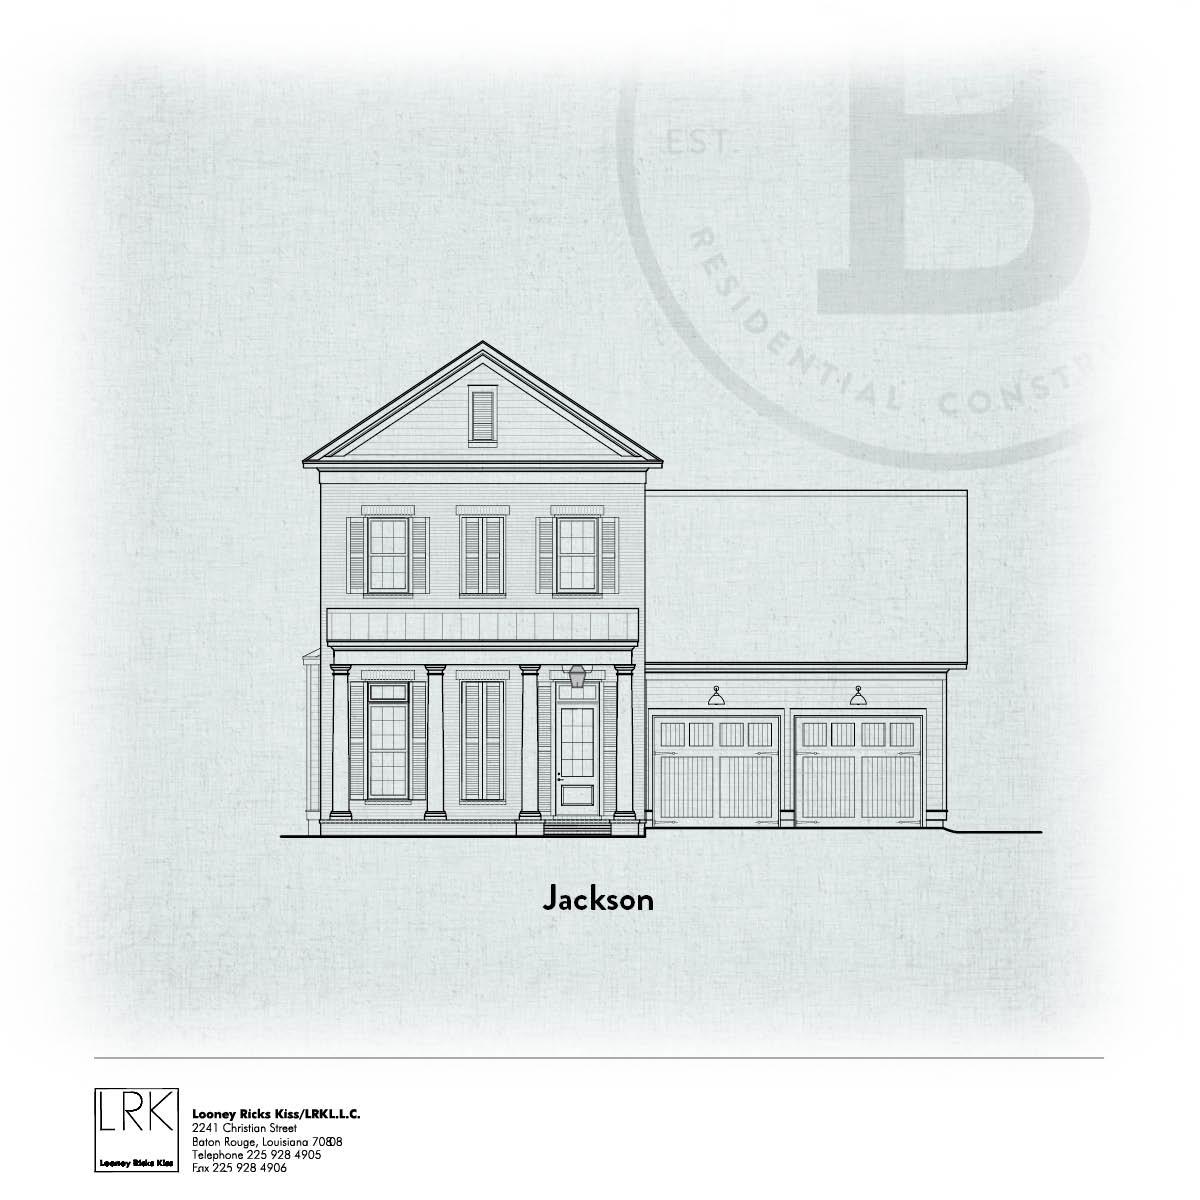 Jackson Elevation